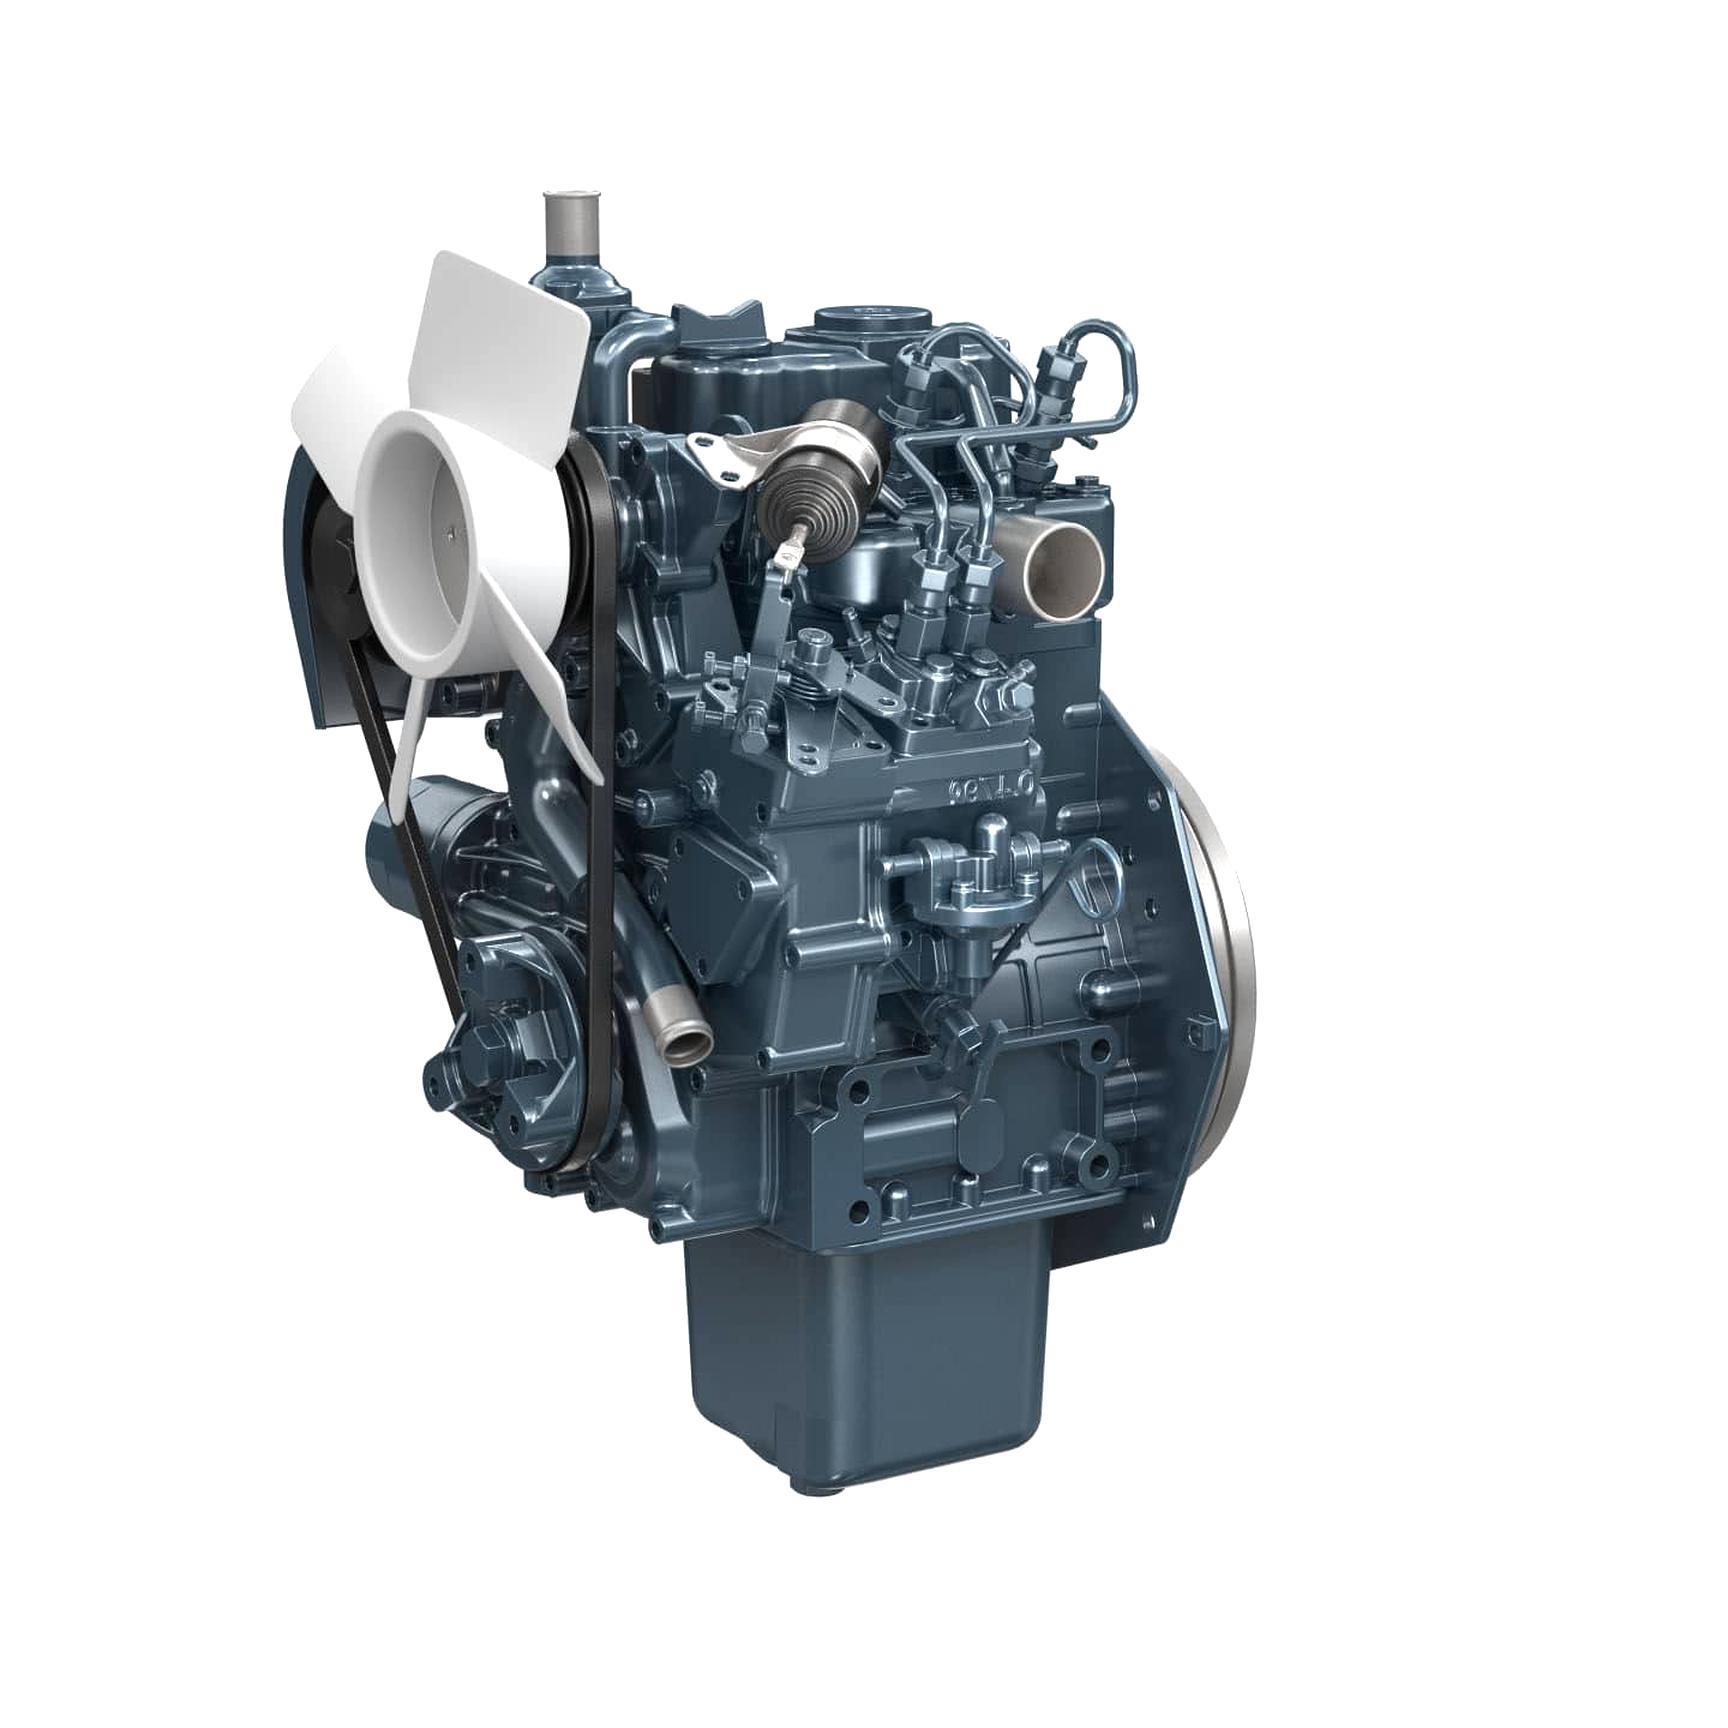 moteur kubota cylindre d'occasion